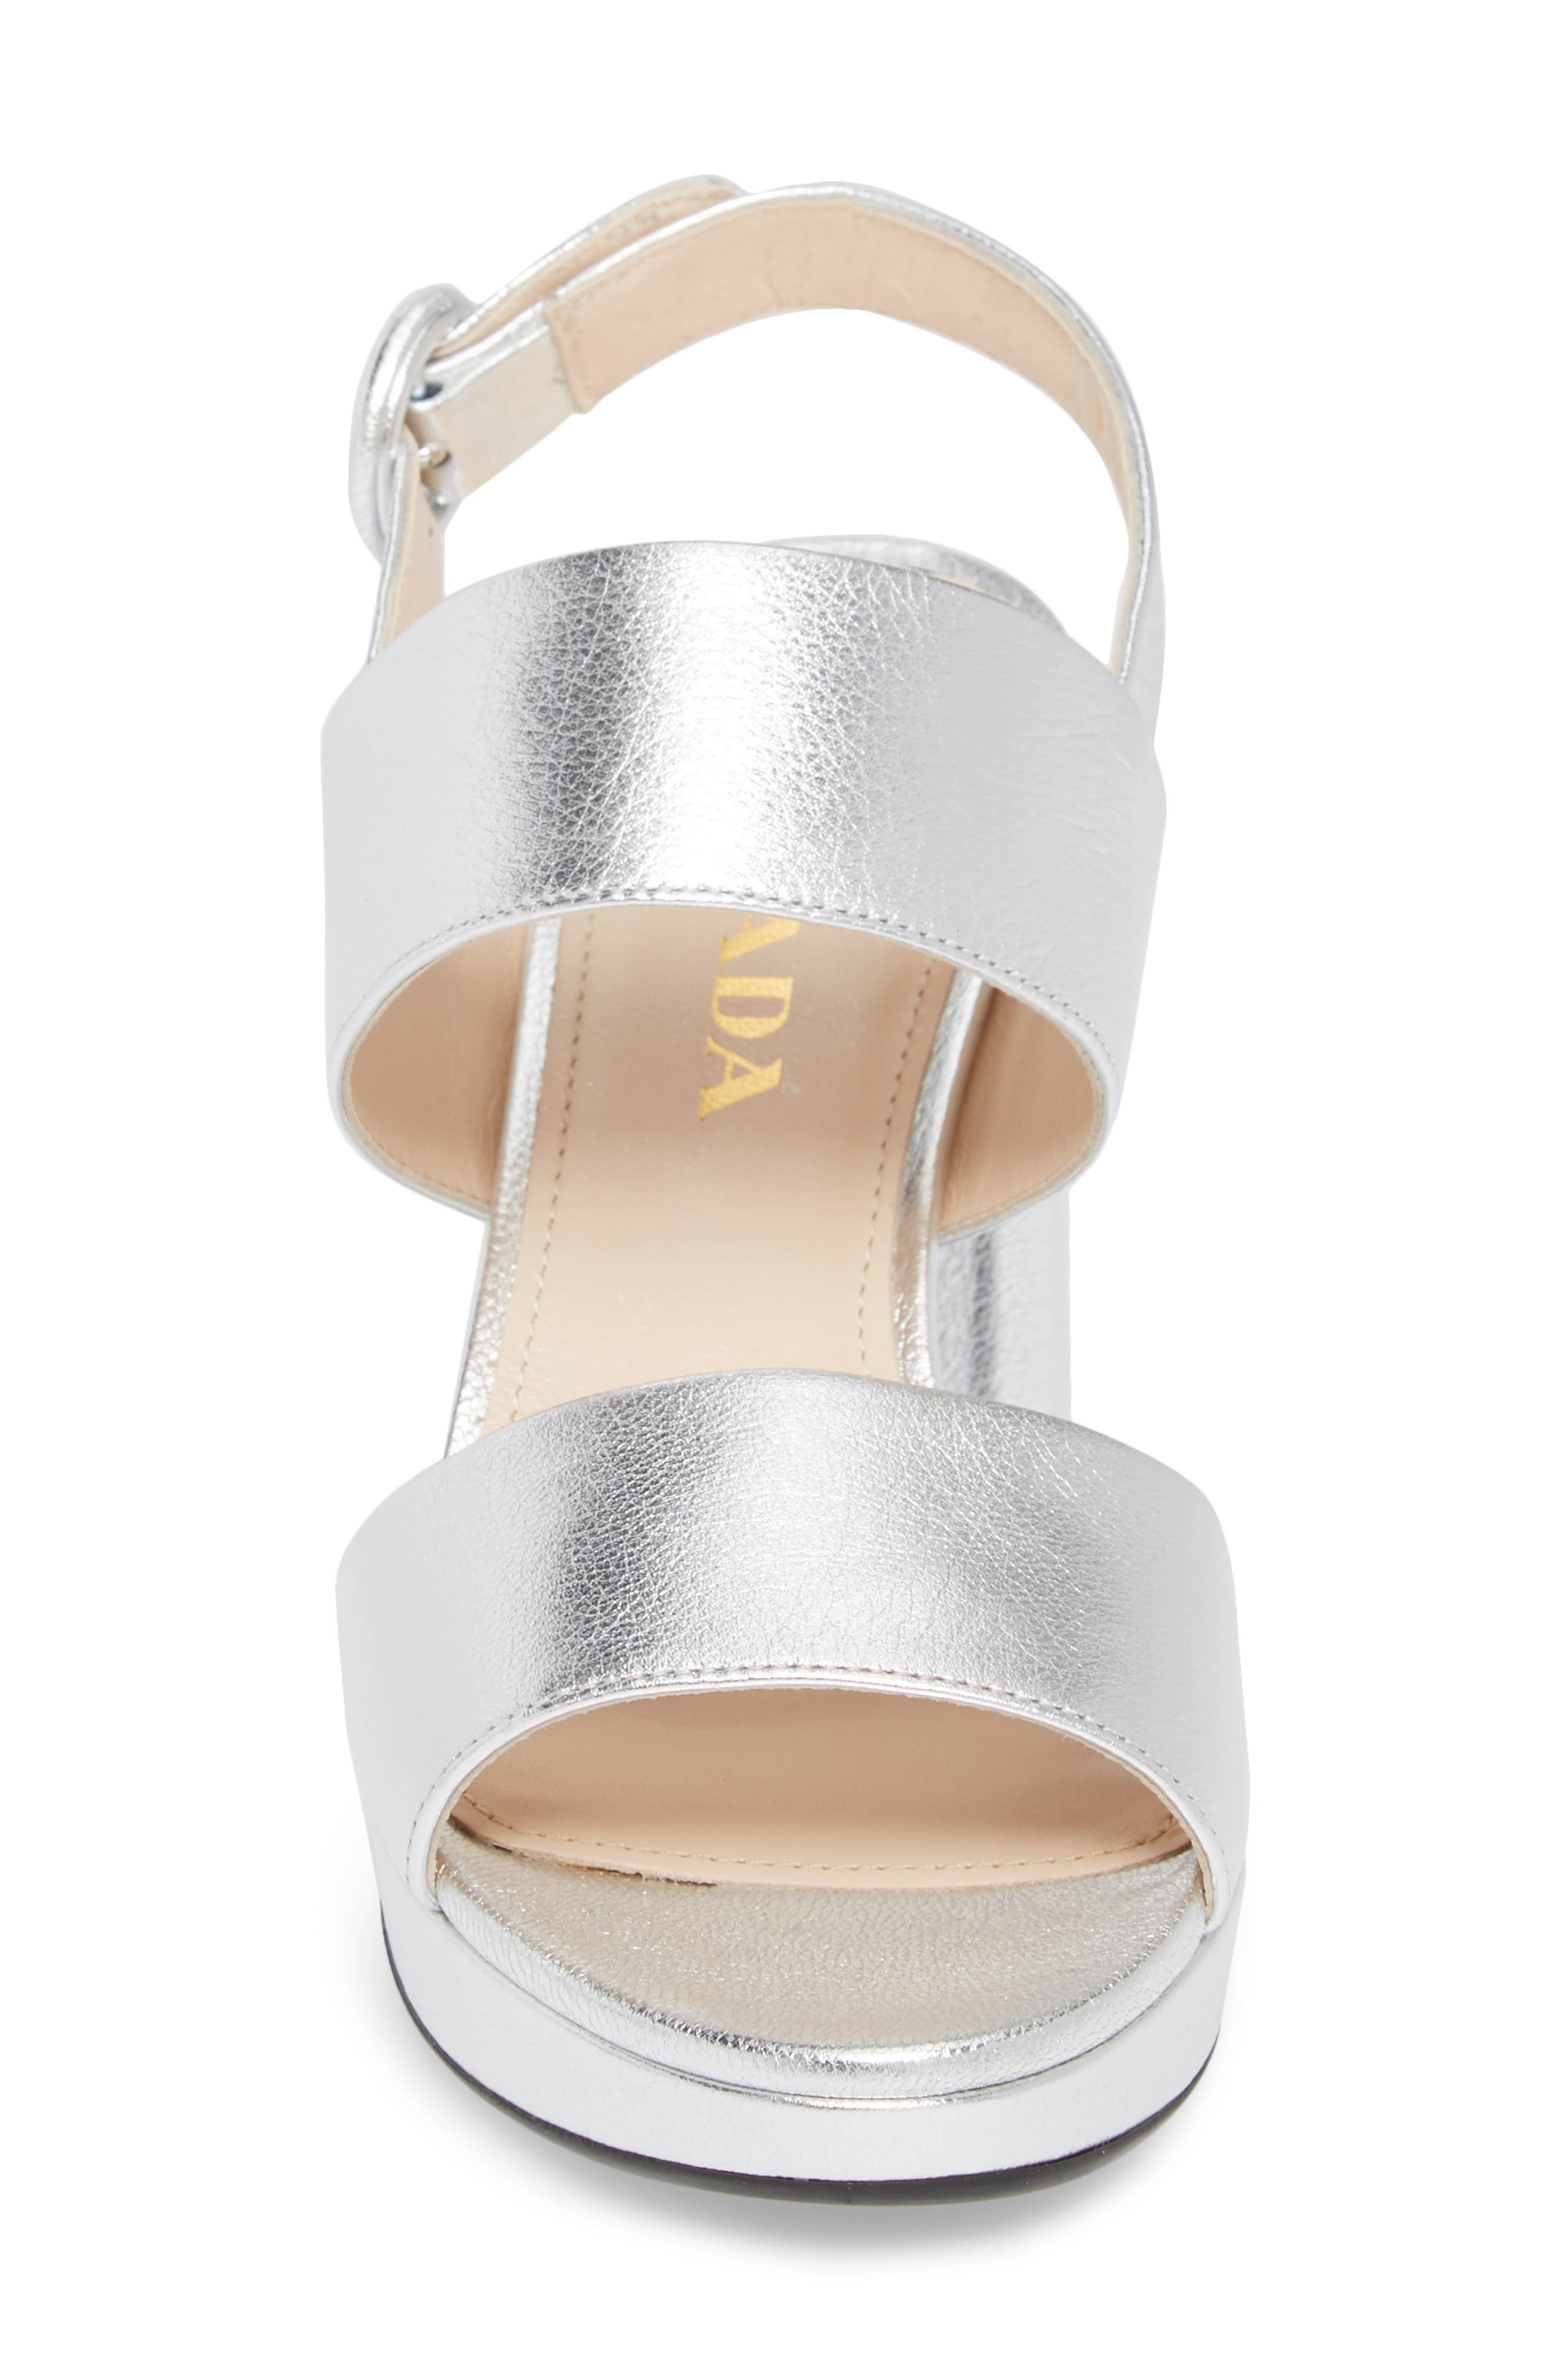 PRADA, Double Band Platform Sandal, Alternate thumbnail 4, color, SILVER